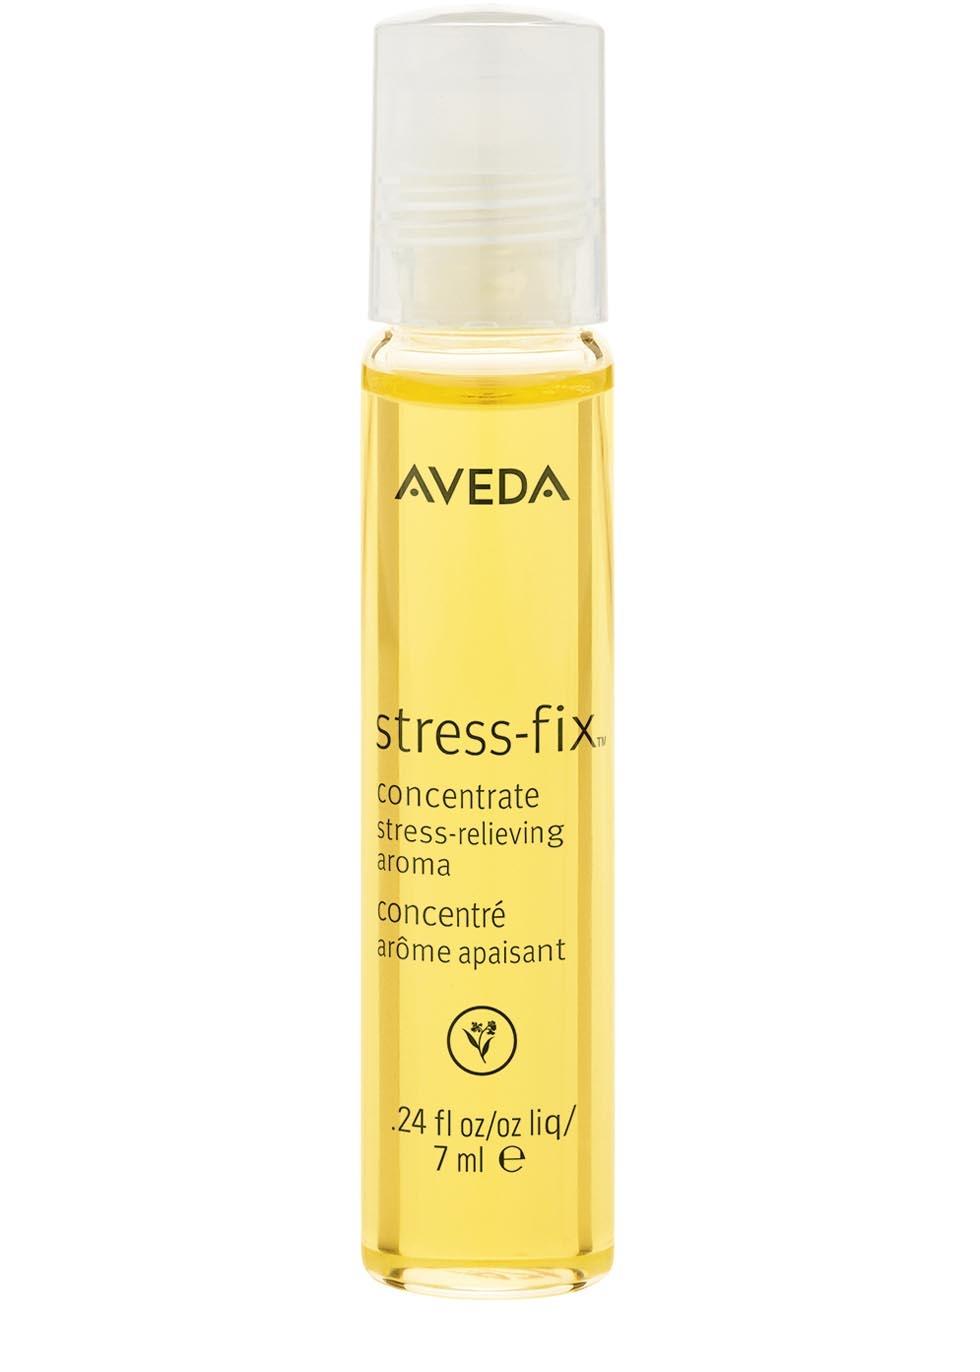 Stress-Fix™ Pure-Fume Rollerball 7ml